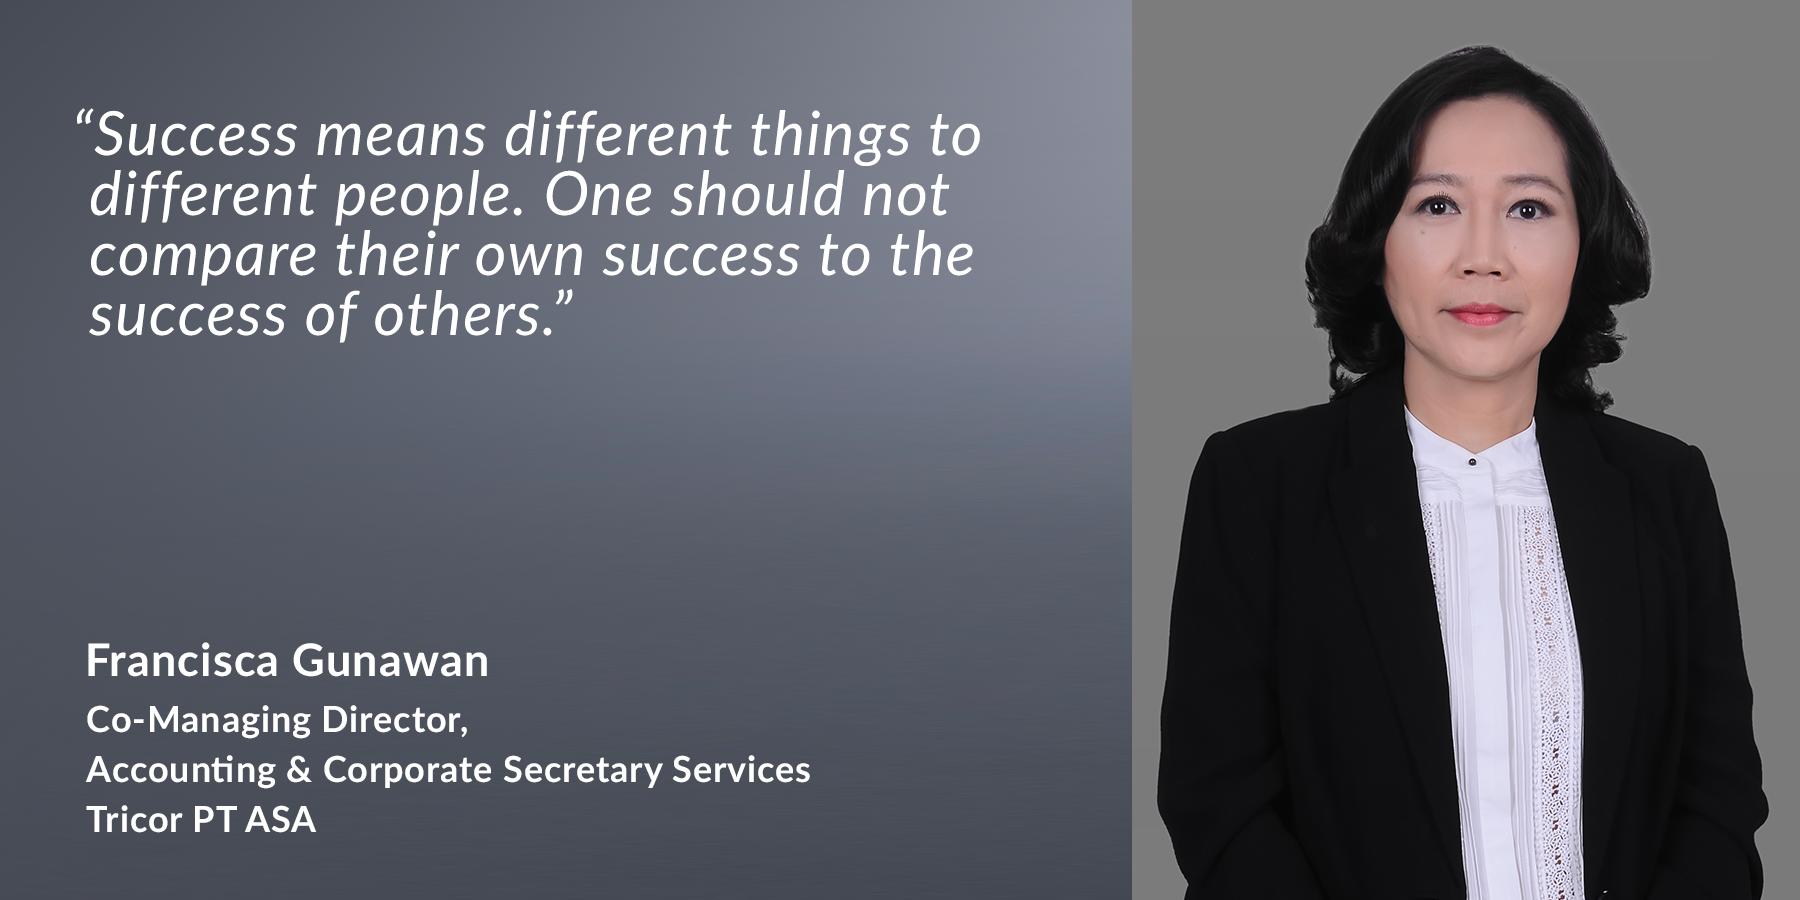 Francisca Gunawan - Co-Managing Director, Accounting & Corporate Secretary Services - Tricor PT ASA